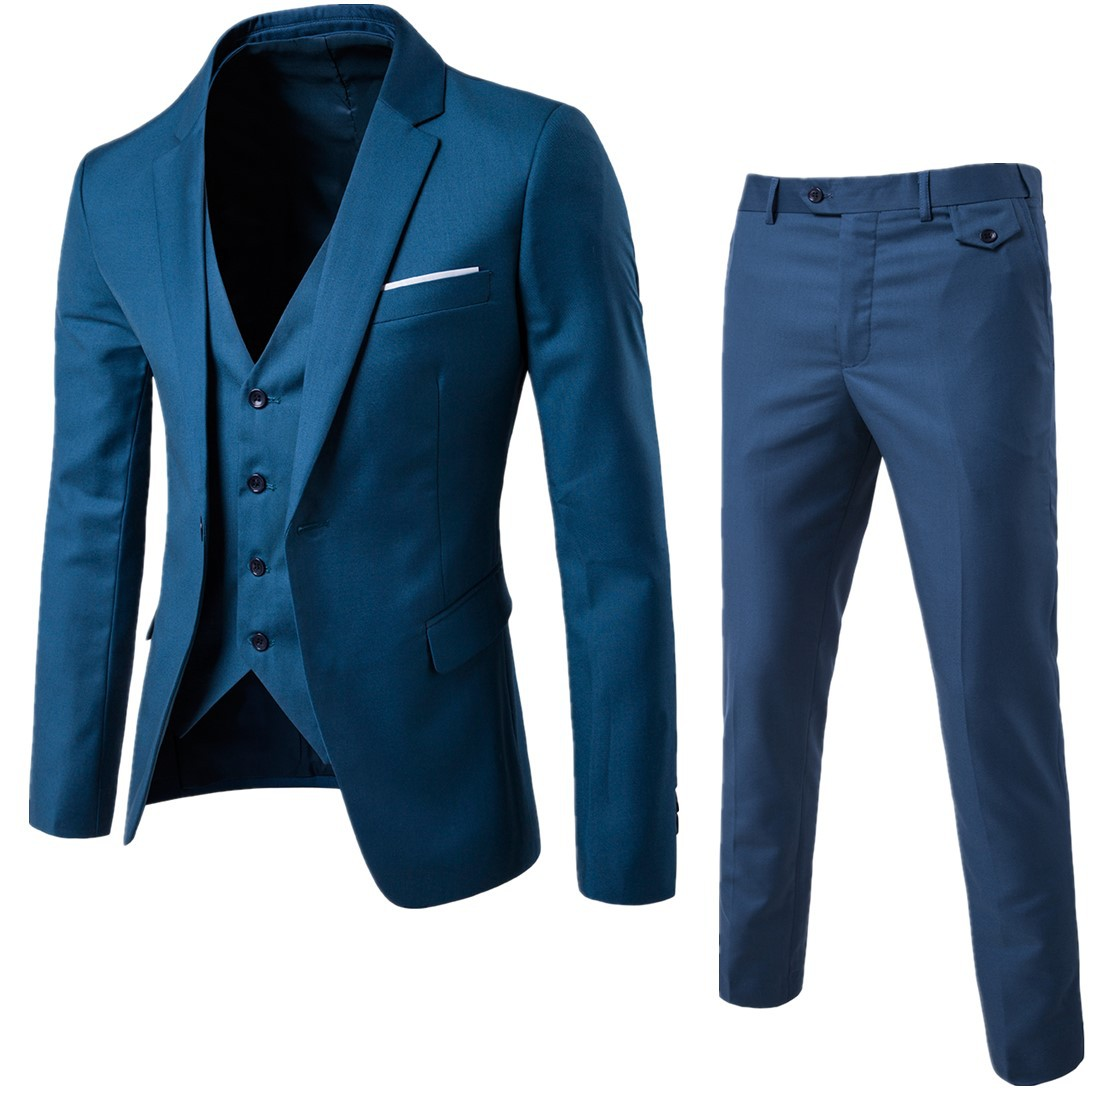 Suit Men Three-piece Set Korean-style Slim Fit Suit Best Man Groom Marriage Formal Dress Men's